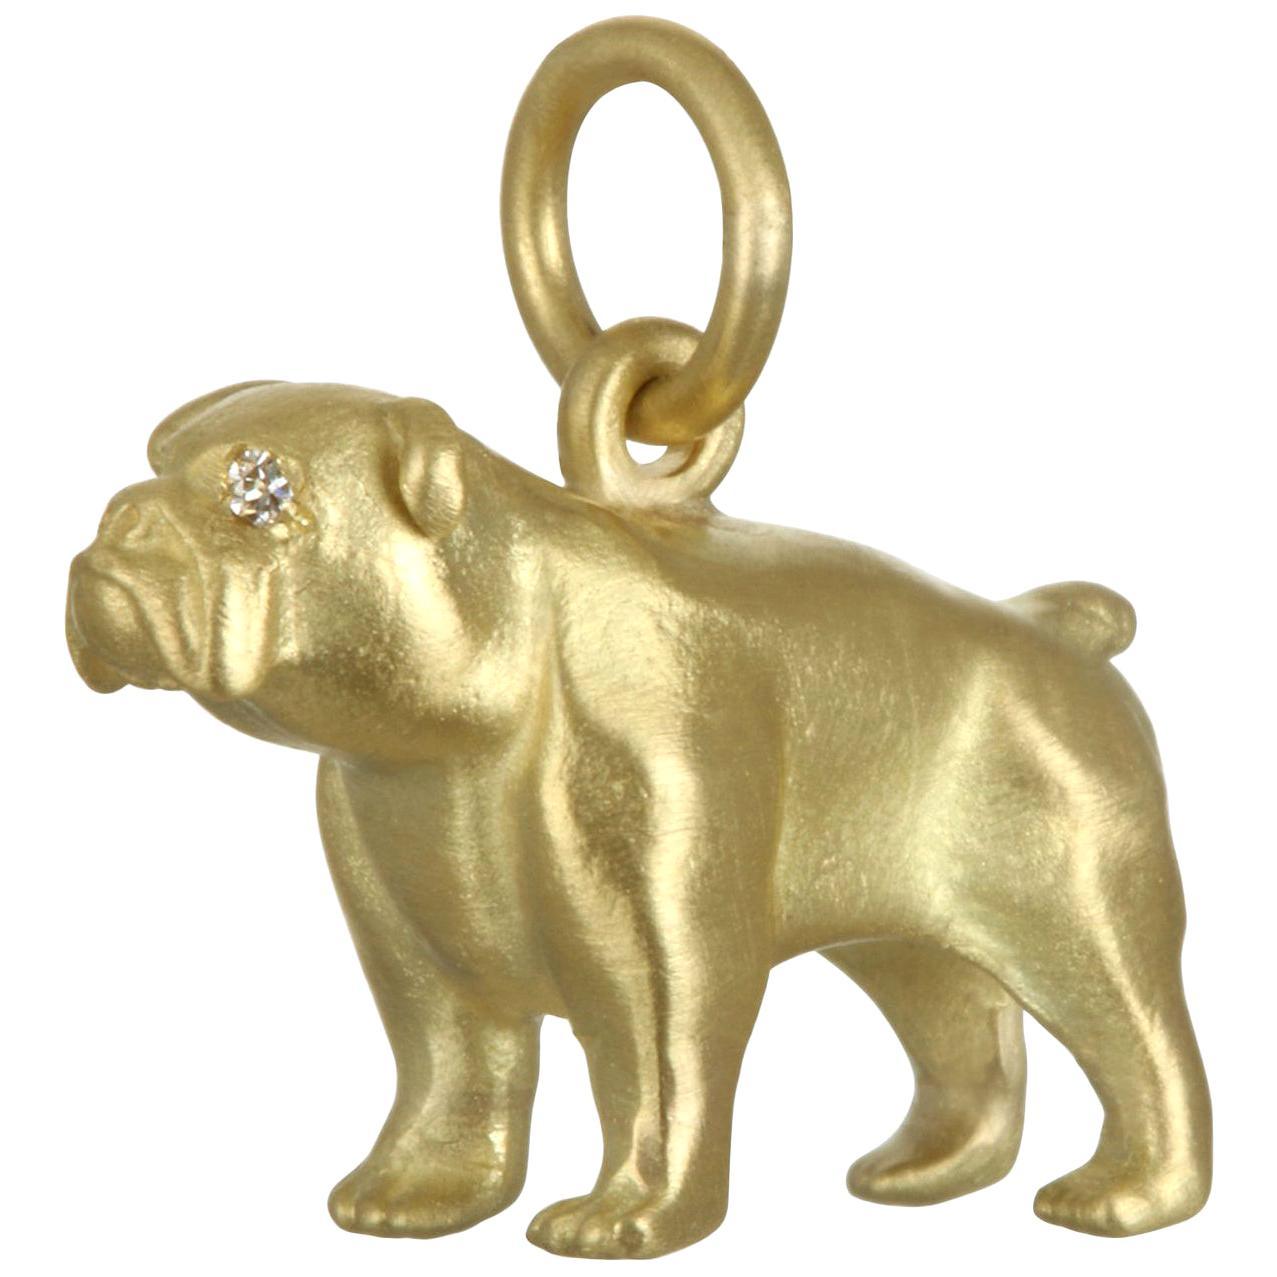 Faye Kim 18 Karat Gold Charm Necklace, English Bulldog with Diamond Eyes